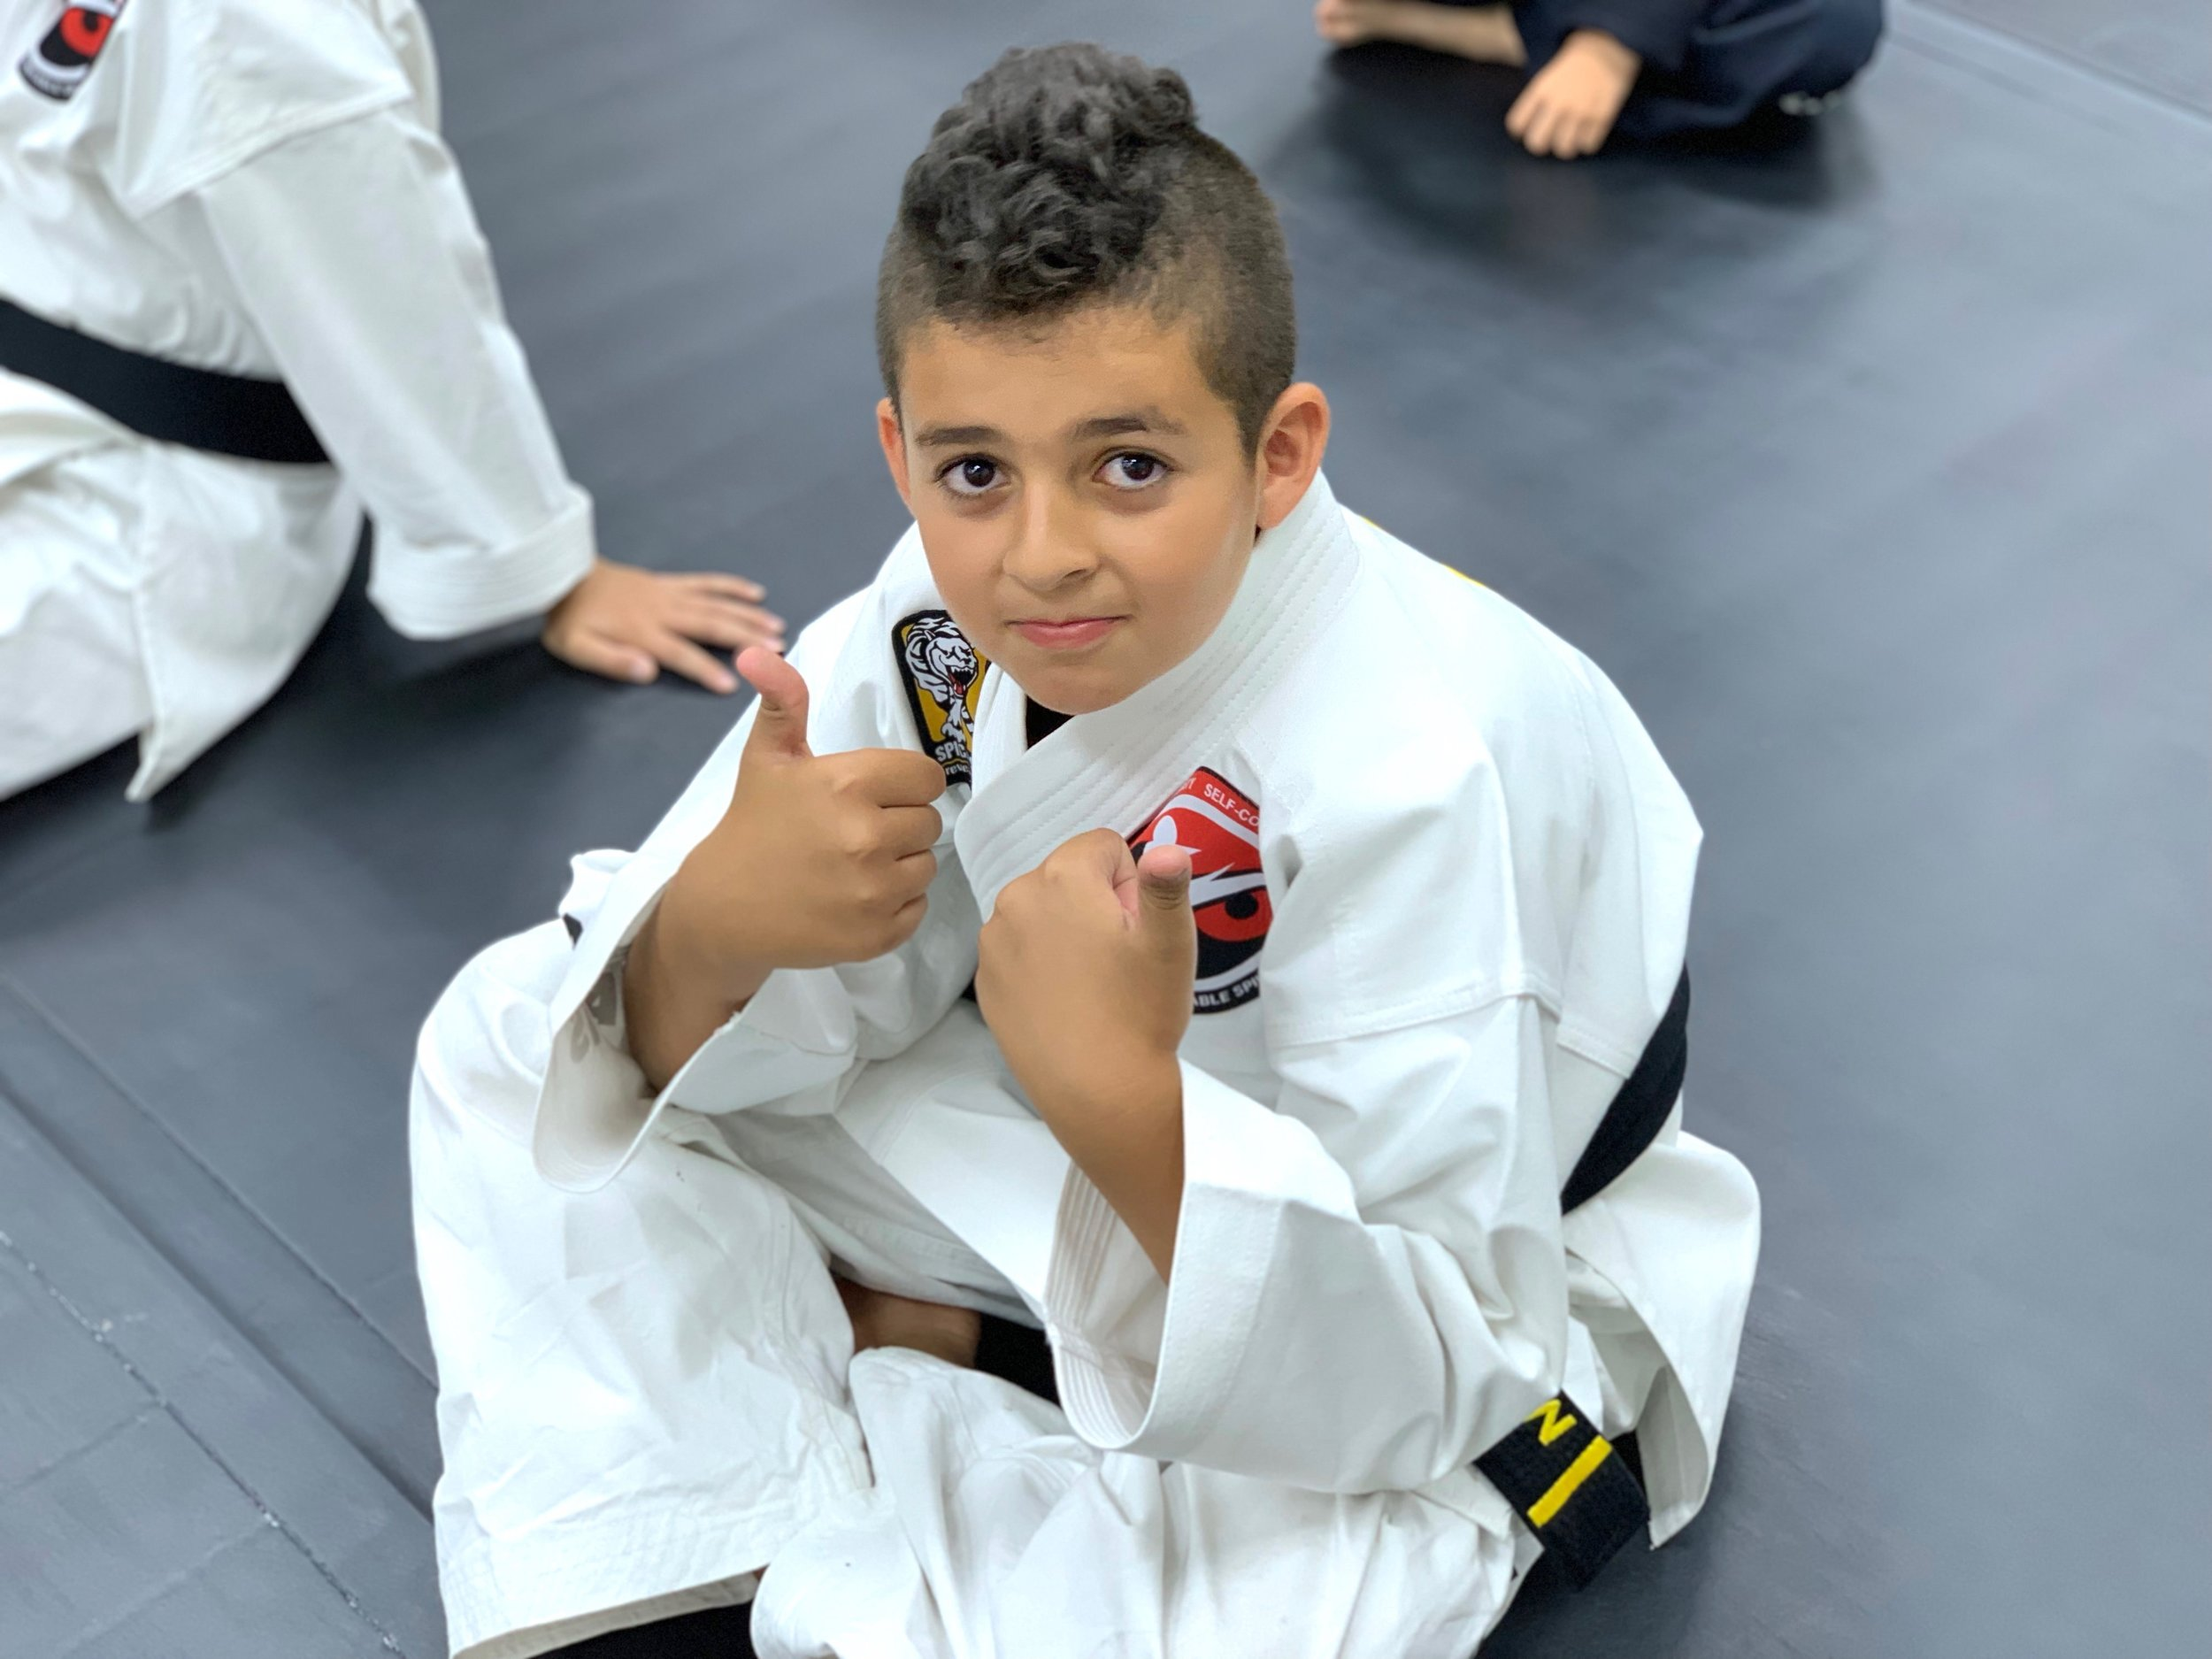 karate-kids-program-souhtlake-keller-grapevine-texas00025.jpeg